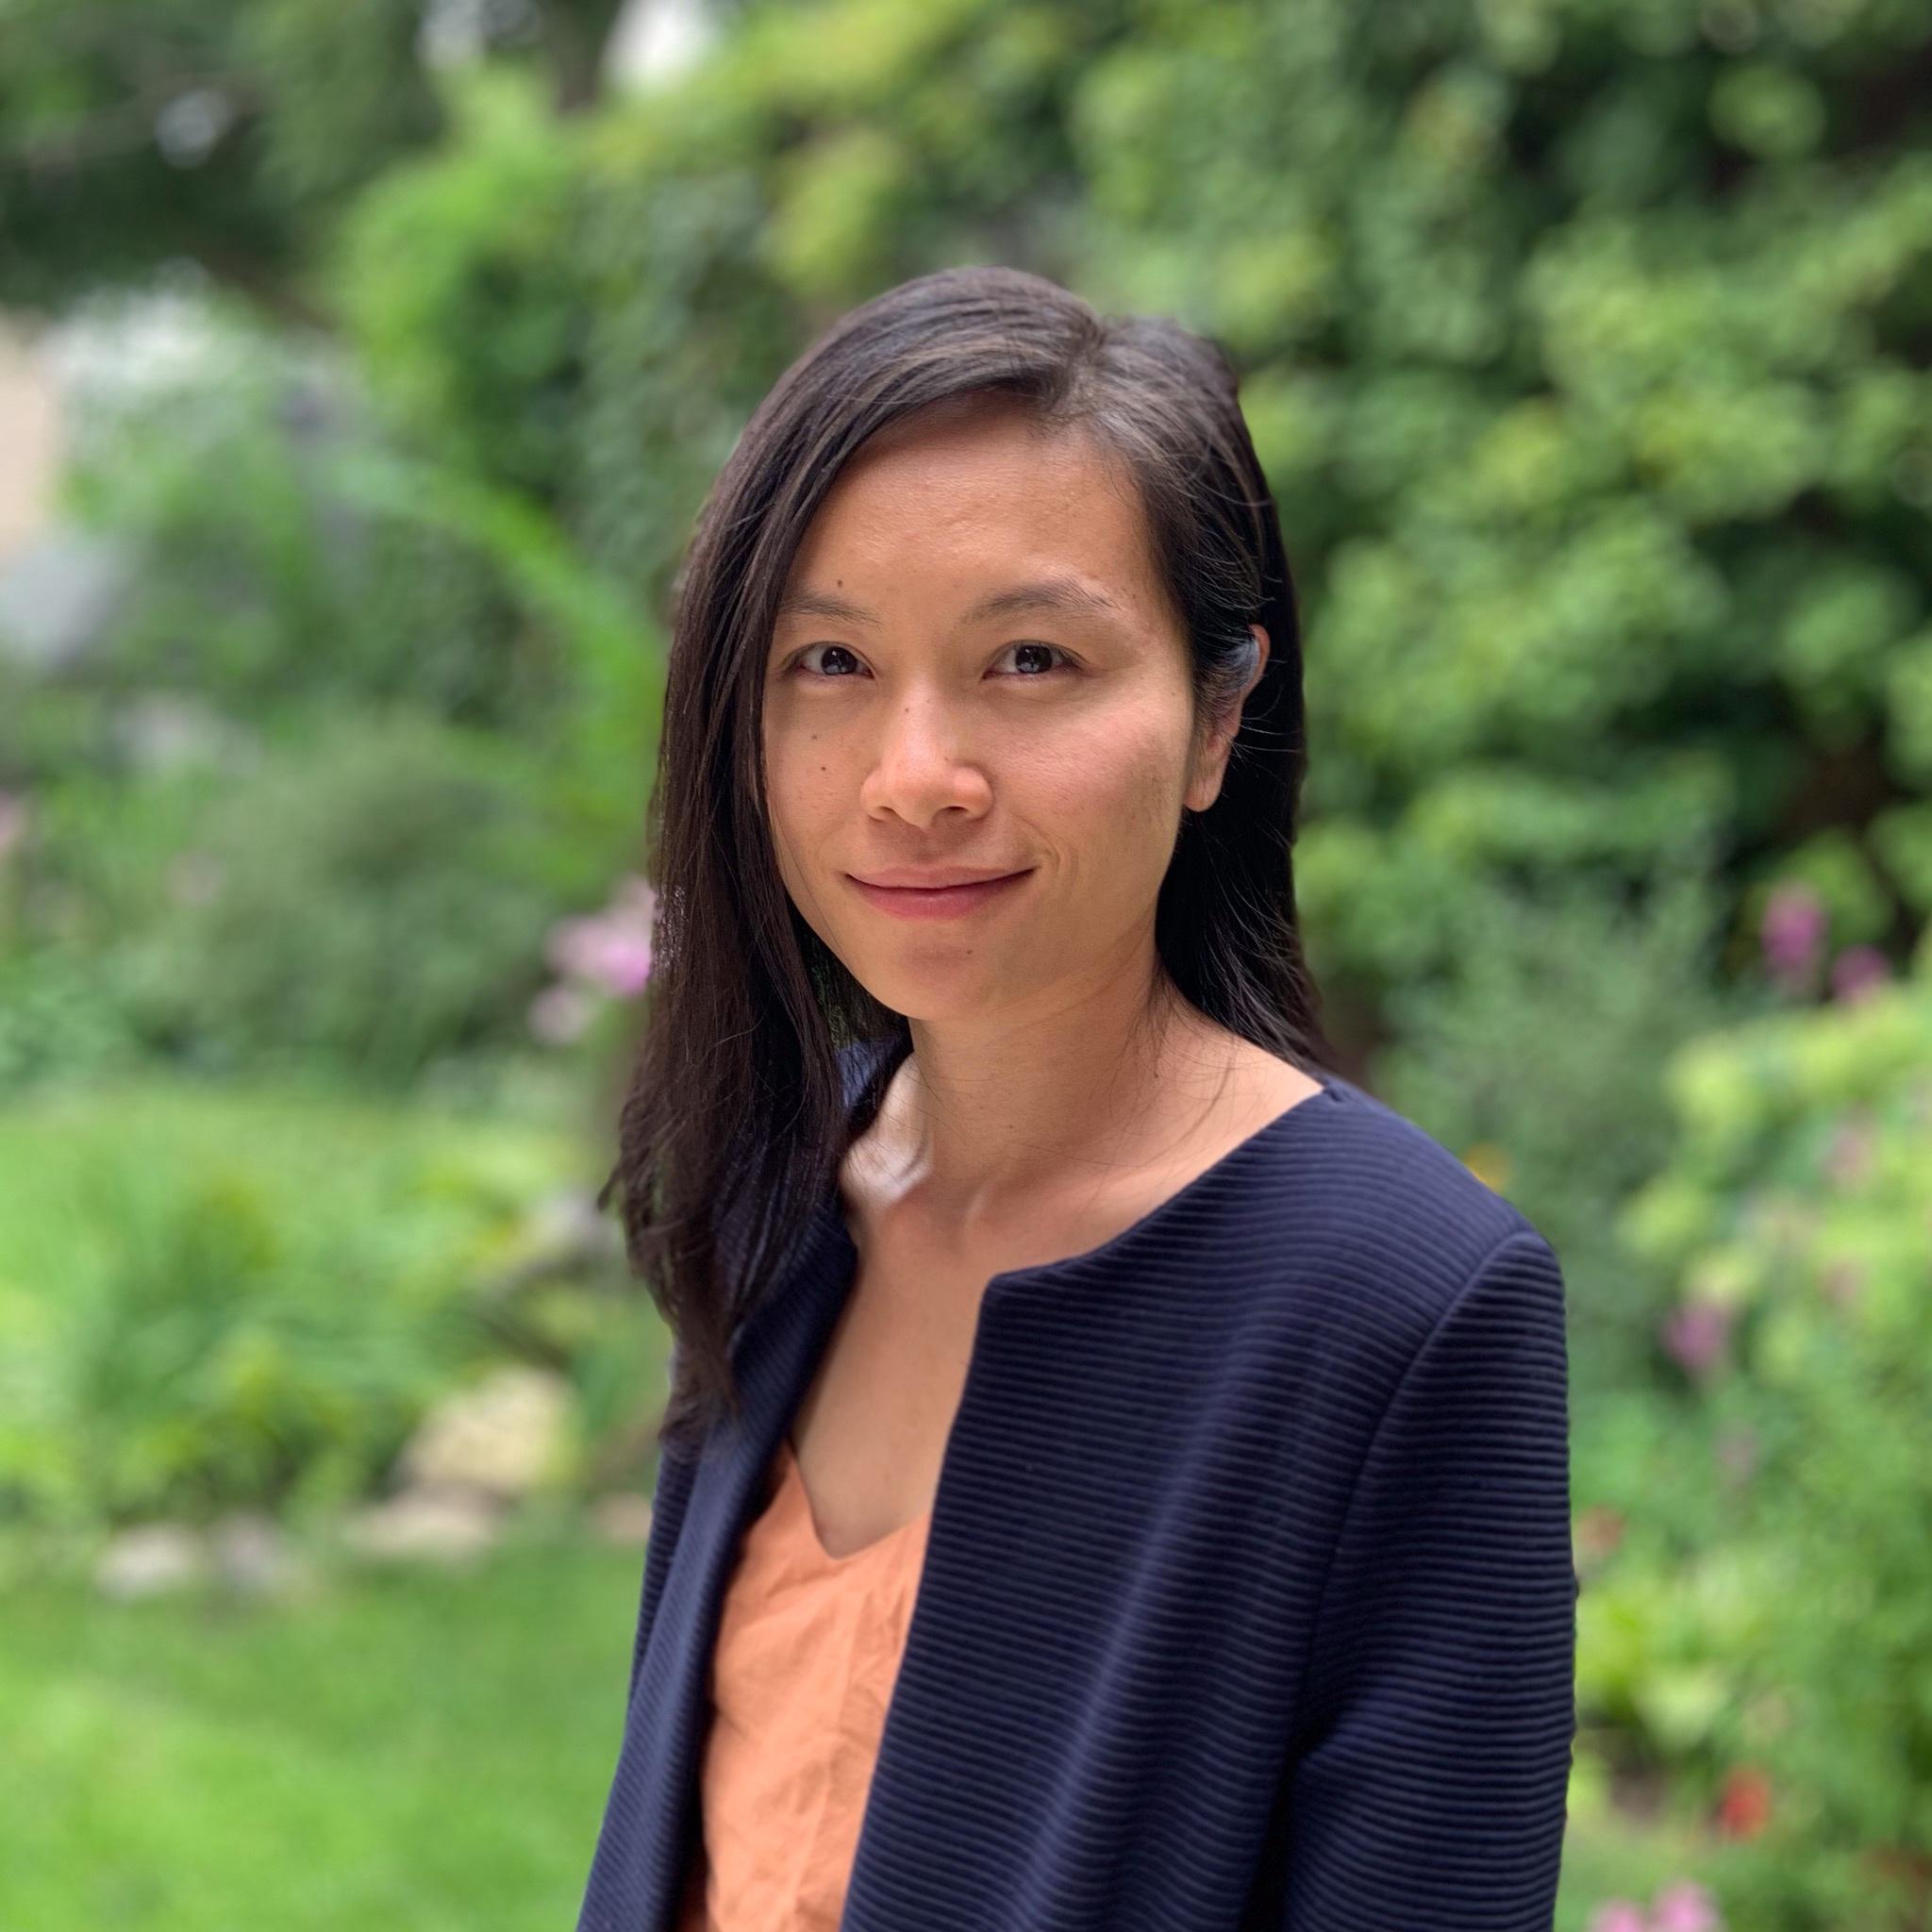 Silvia Clement-Lam, PhD - Postdoctoral Scholar at BrainLENS UConn